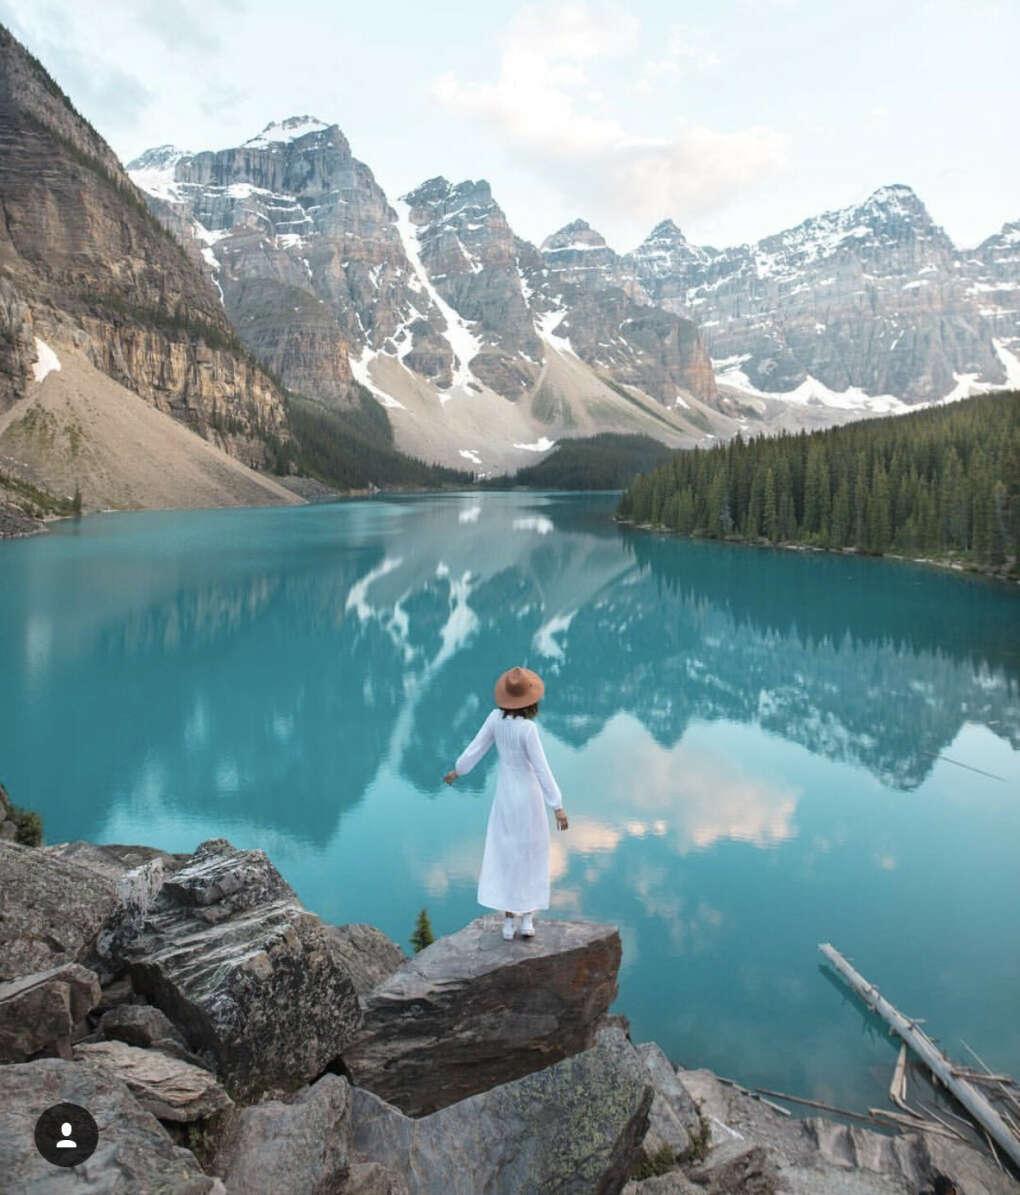 Trip to Moraine Lake (Canada)